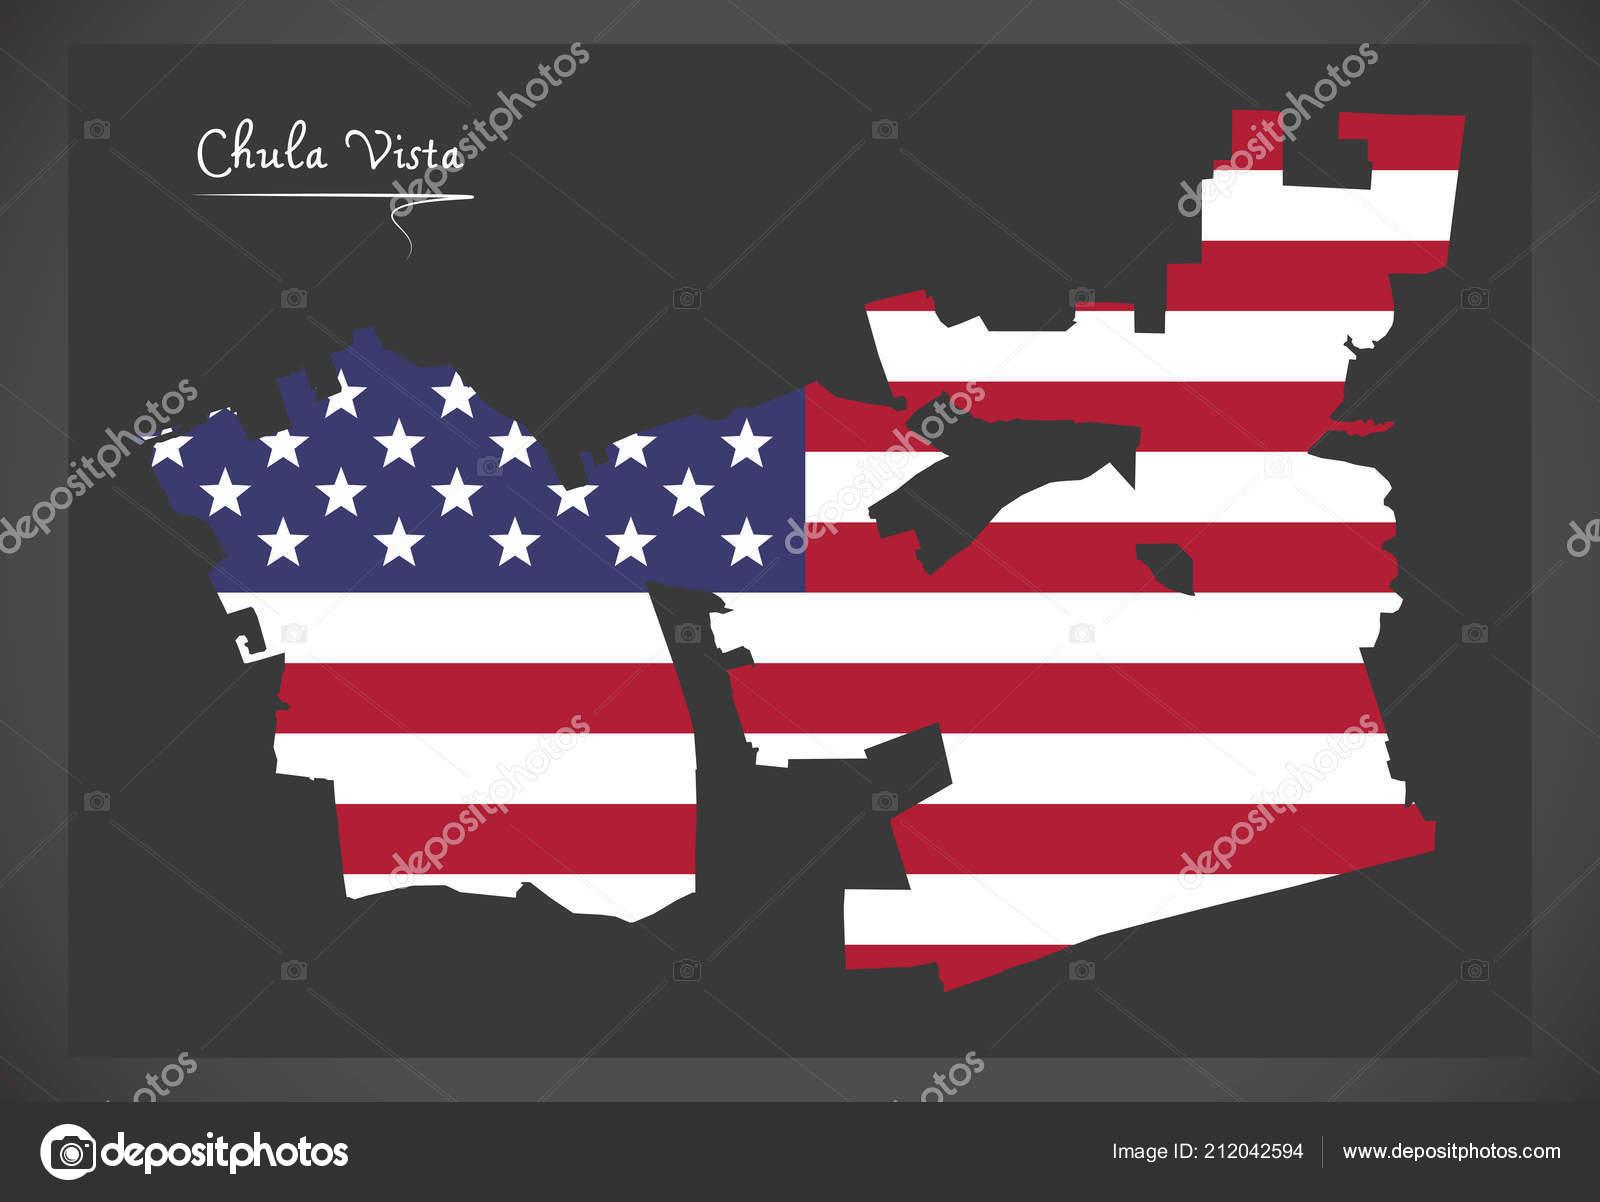 Chula Vista California Map American National Flag Illustration